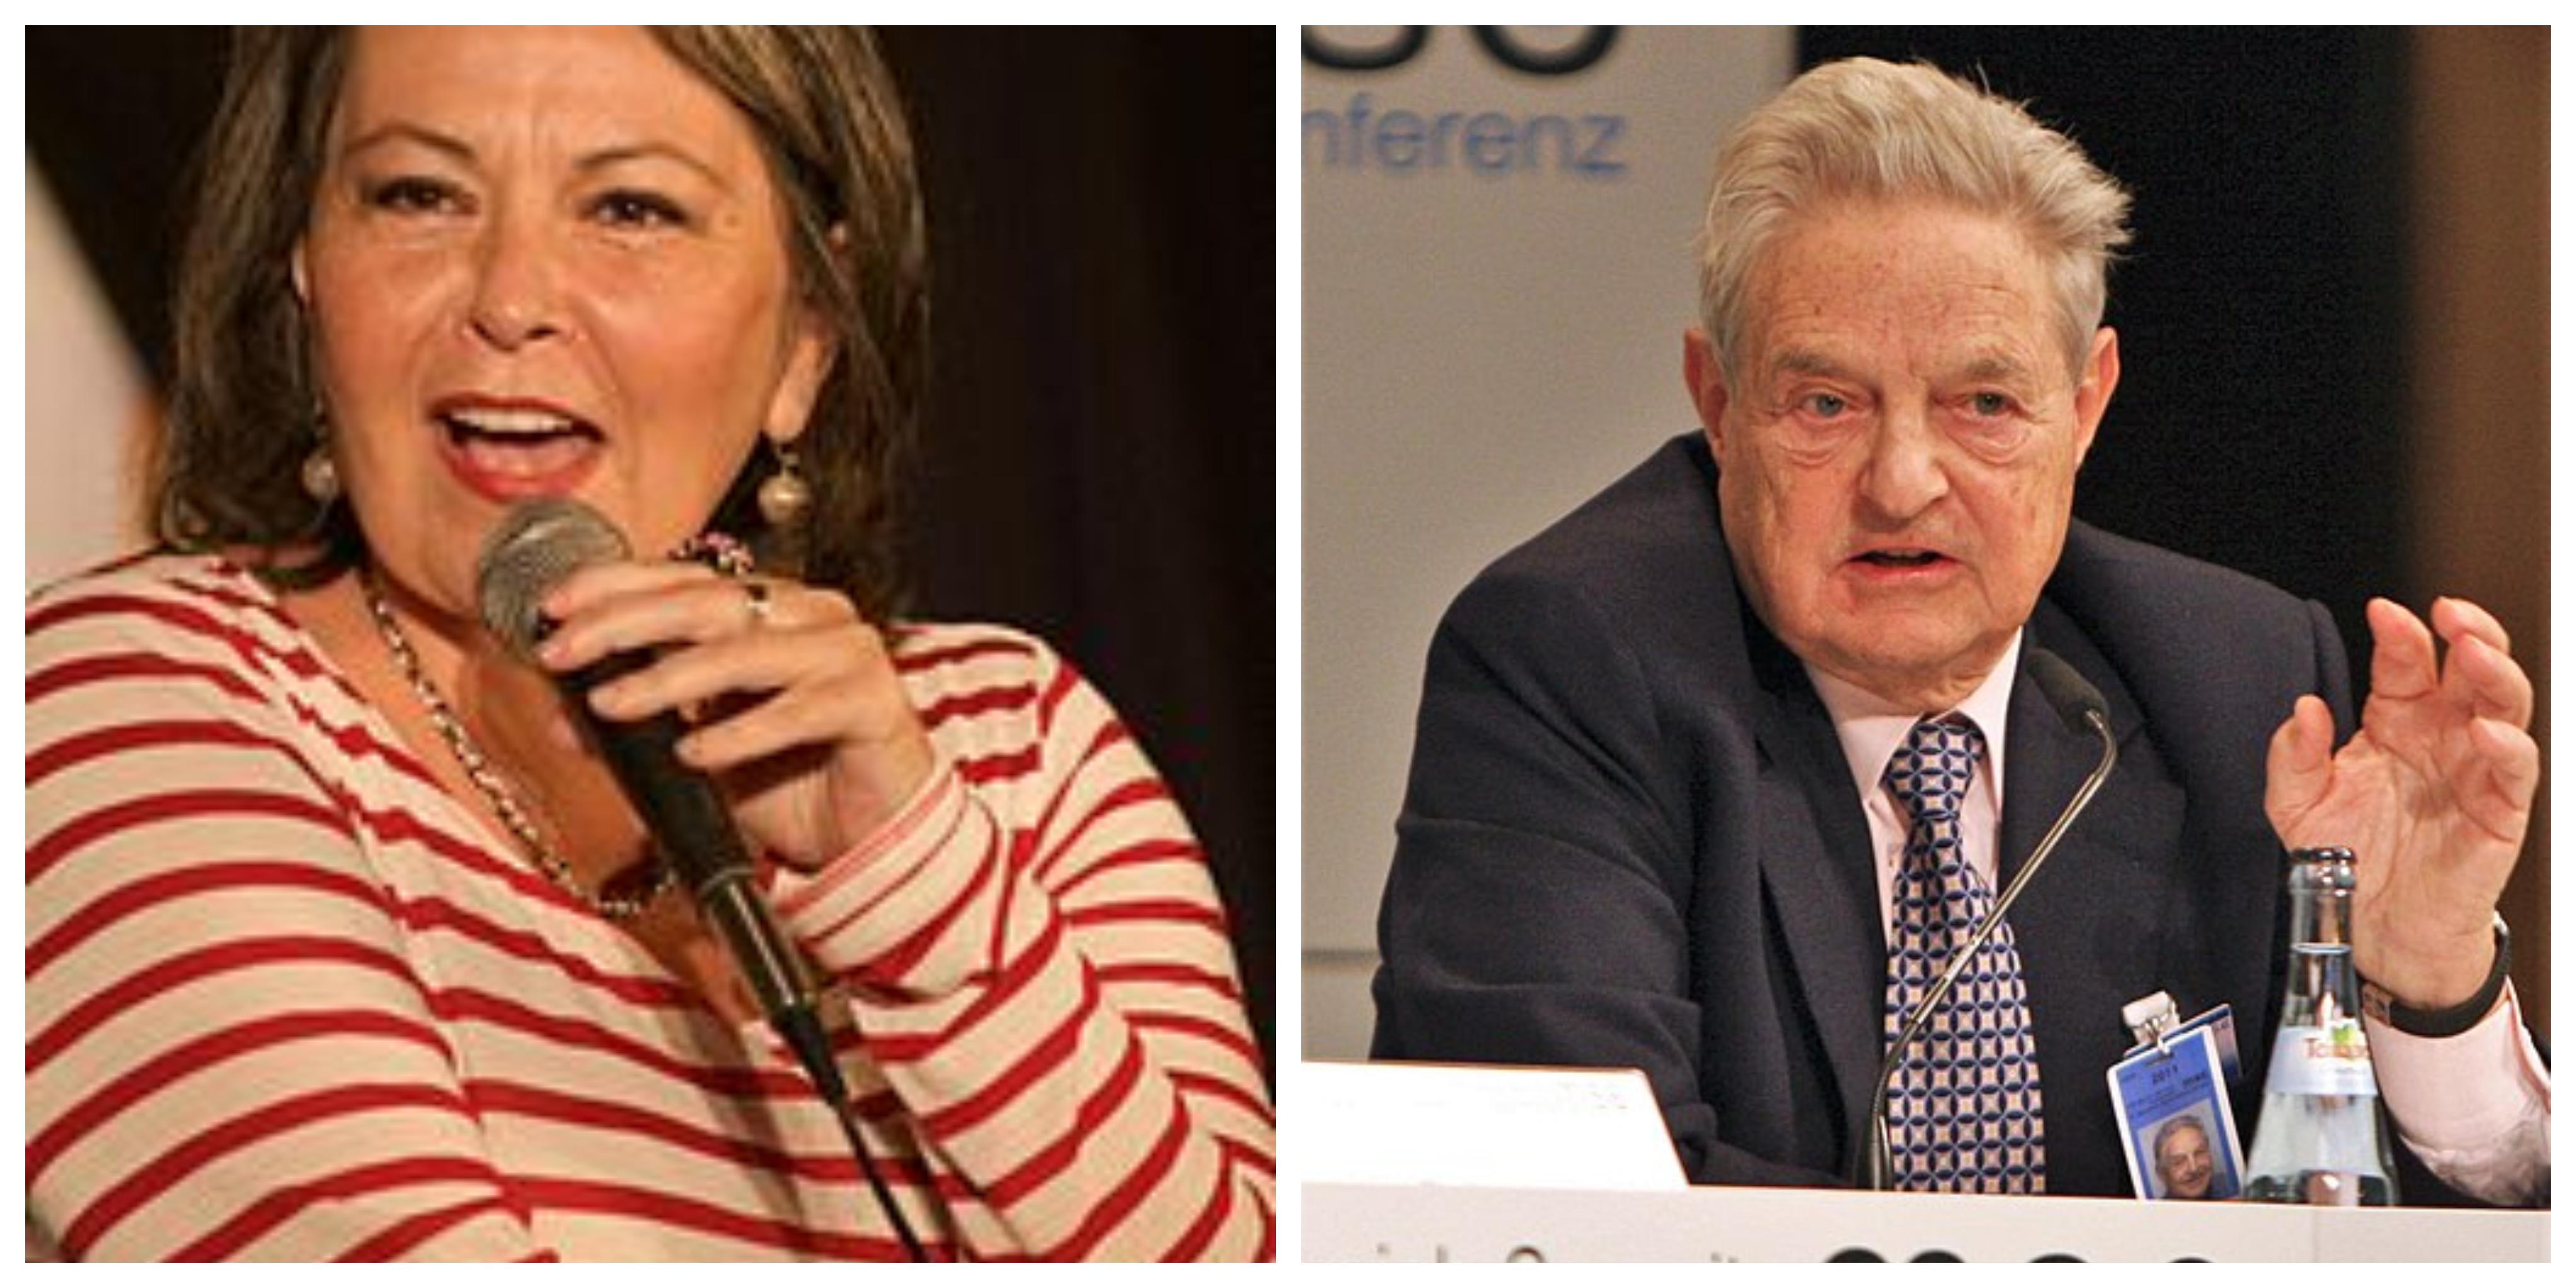 Roseanne Barr, George Soros (Harald Dettenborn [CC BY 3.0 de (https://creativecommons.org/licenses/by/3.0/de/deed.en)], via Wikimedia Commons)